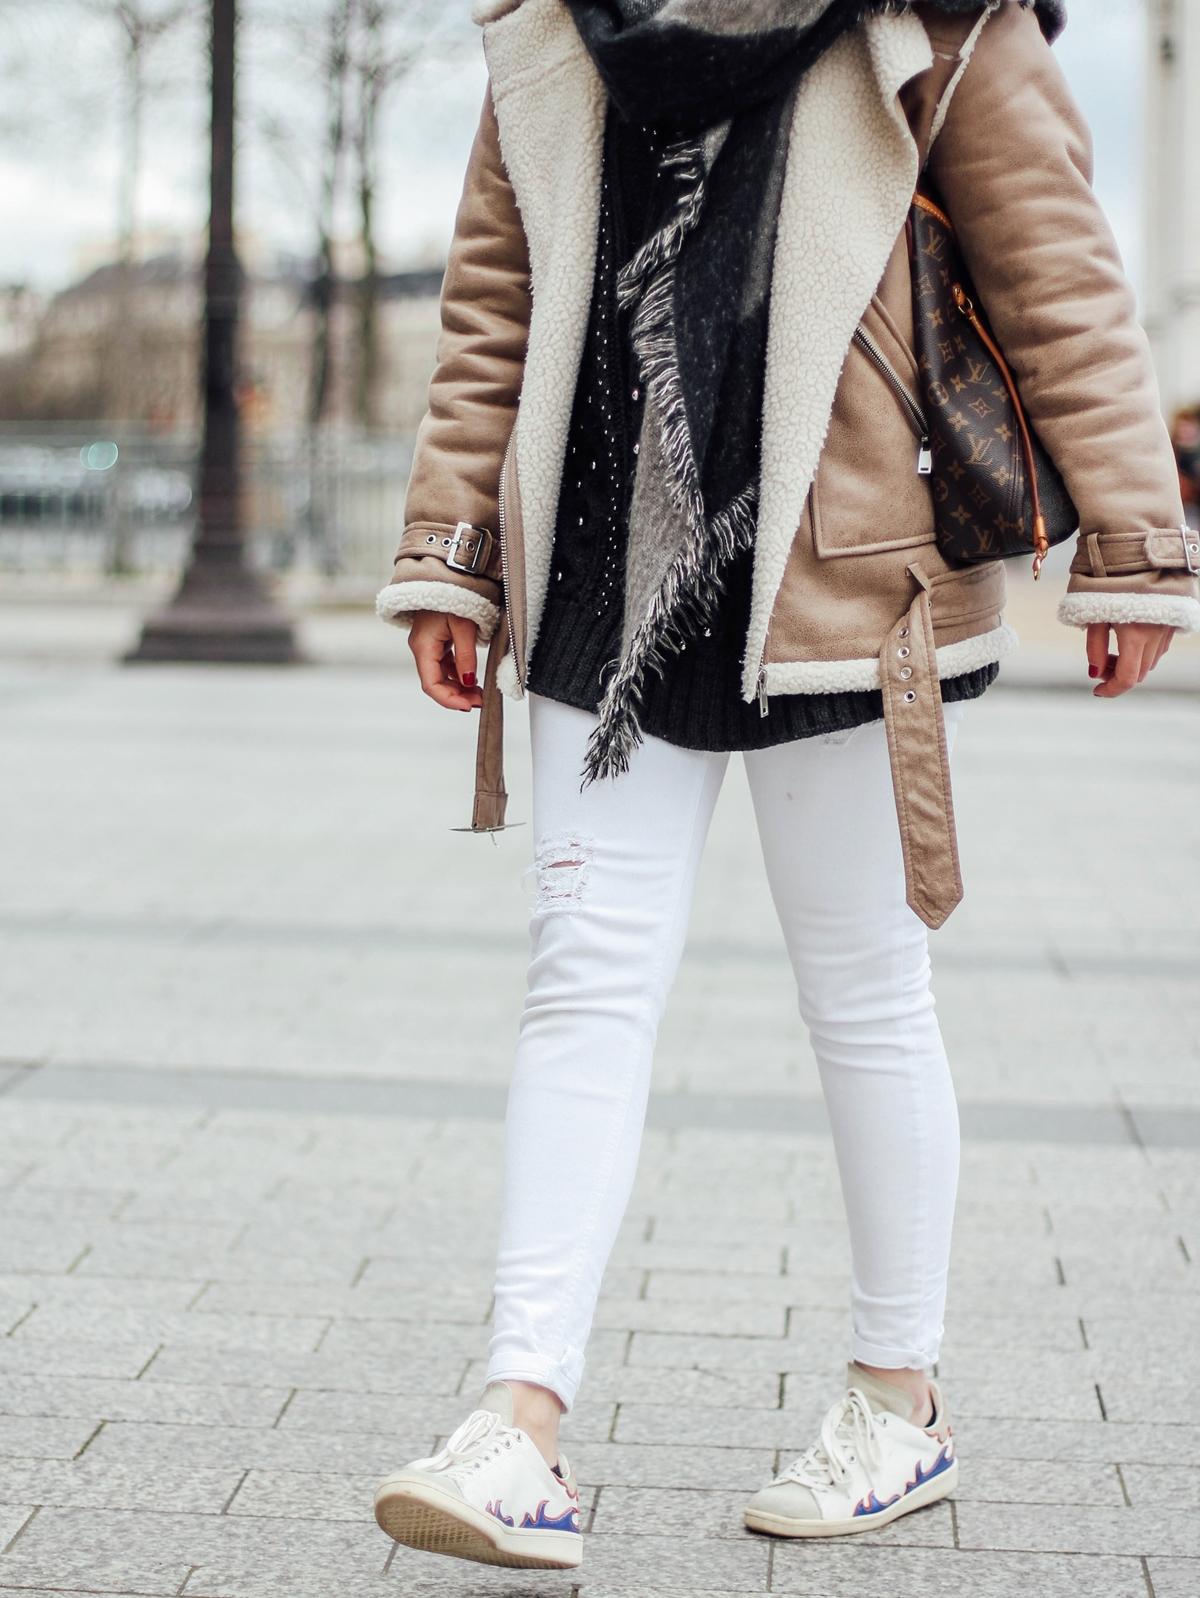 shearling-jacket-beige-isabel-marant-sneakers-streetstyle paris pfw16